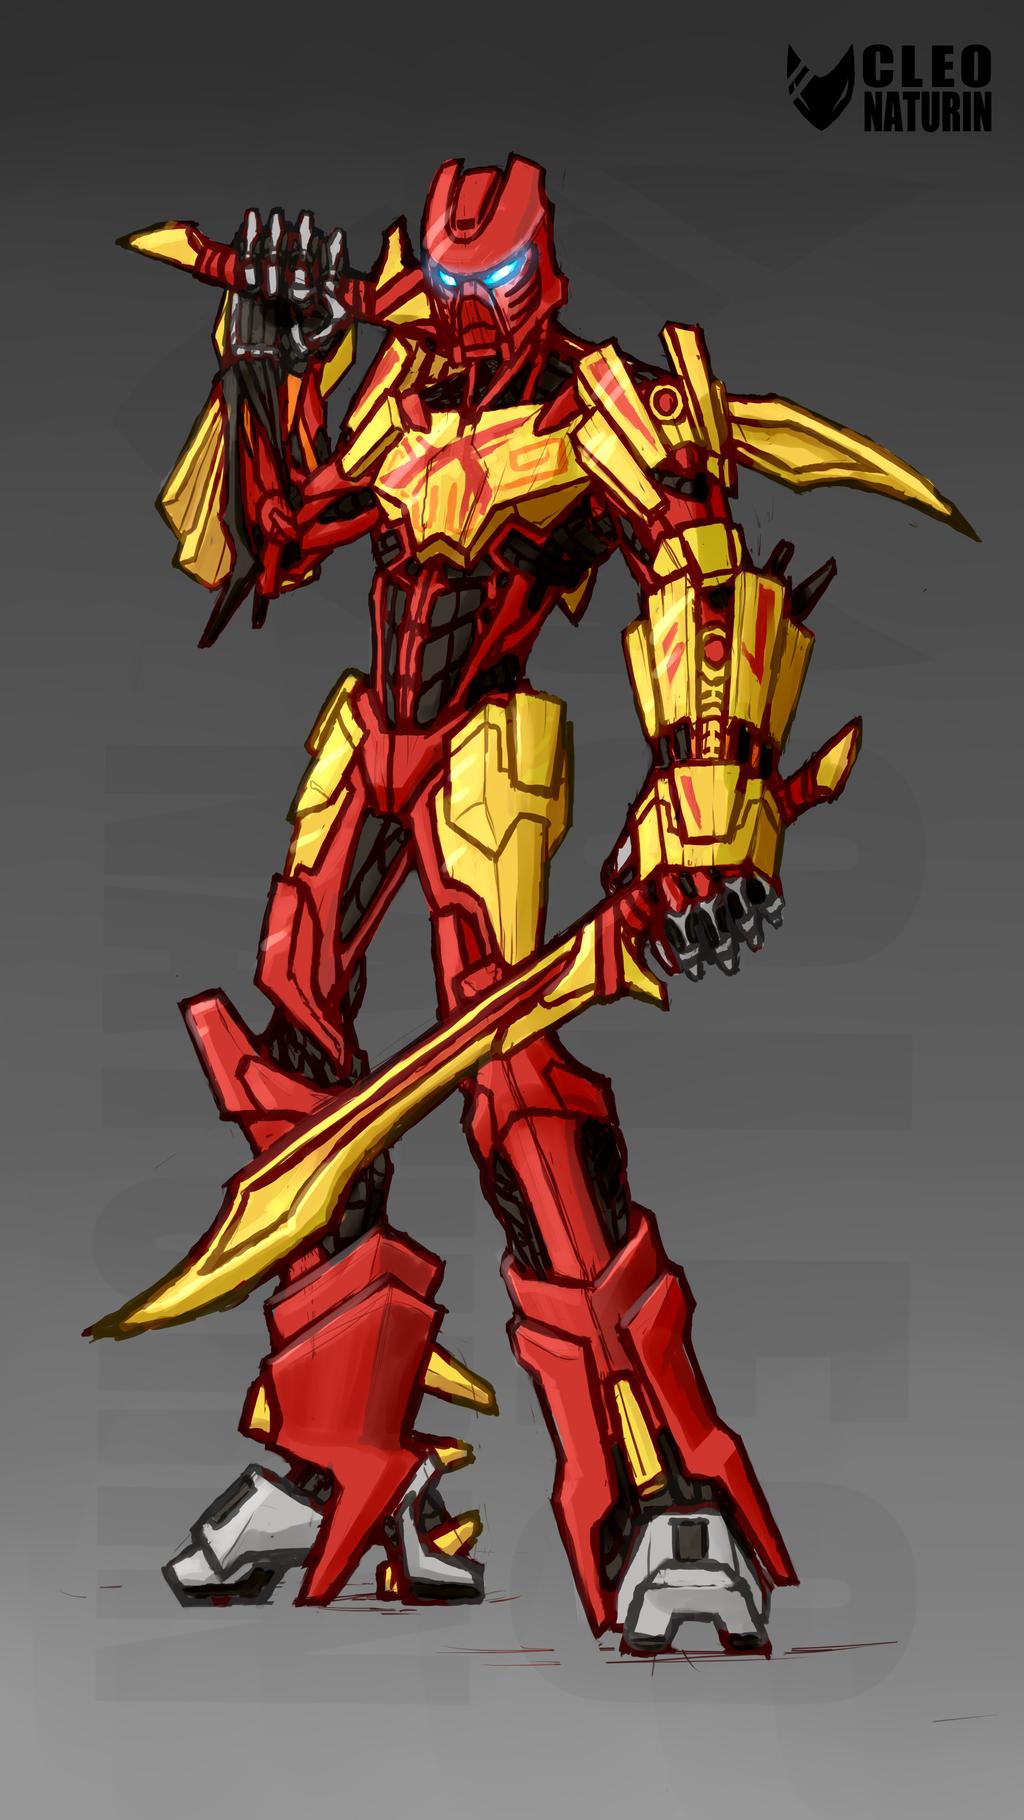 Tahu 2015 Bionicle by Kanoro-Studio.deviantart.com on @DeviantArt ...